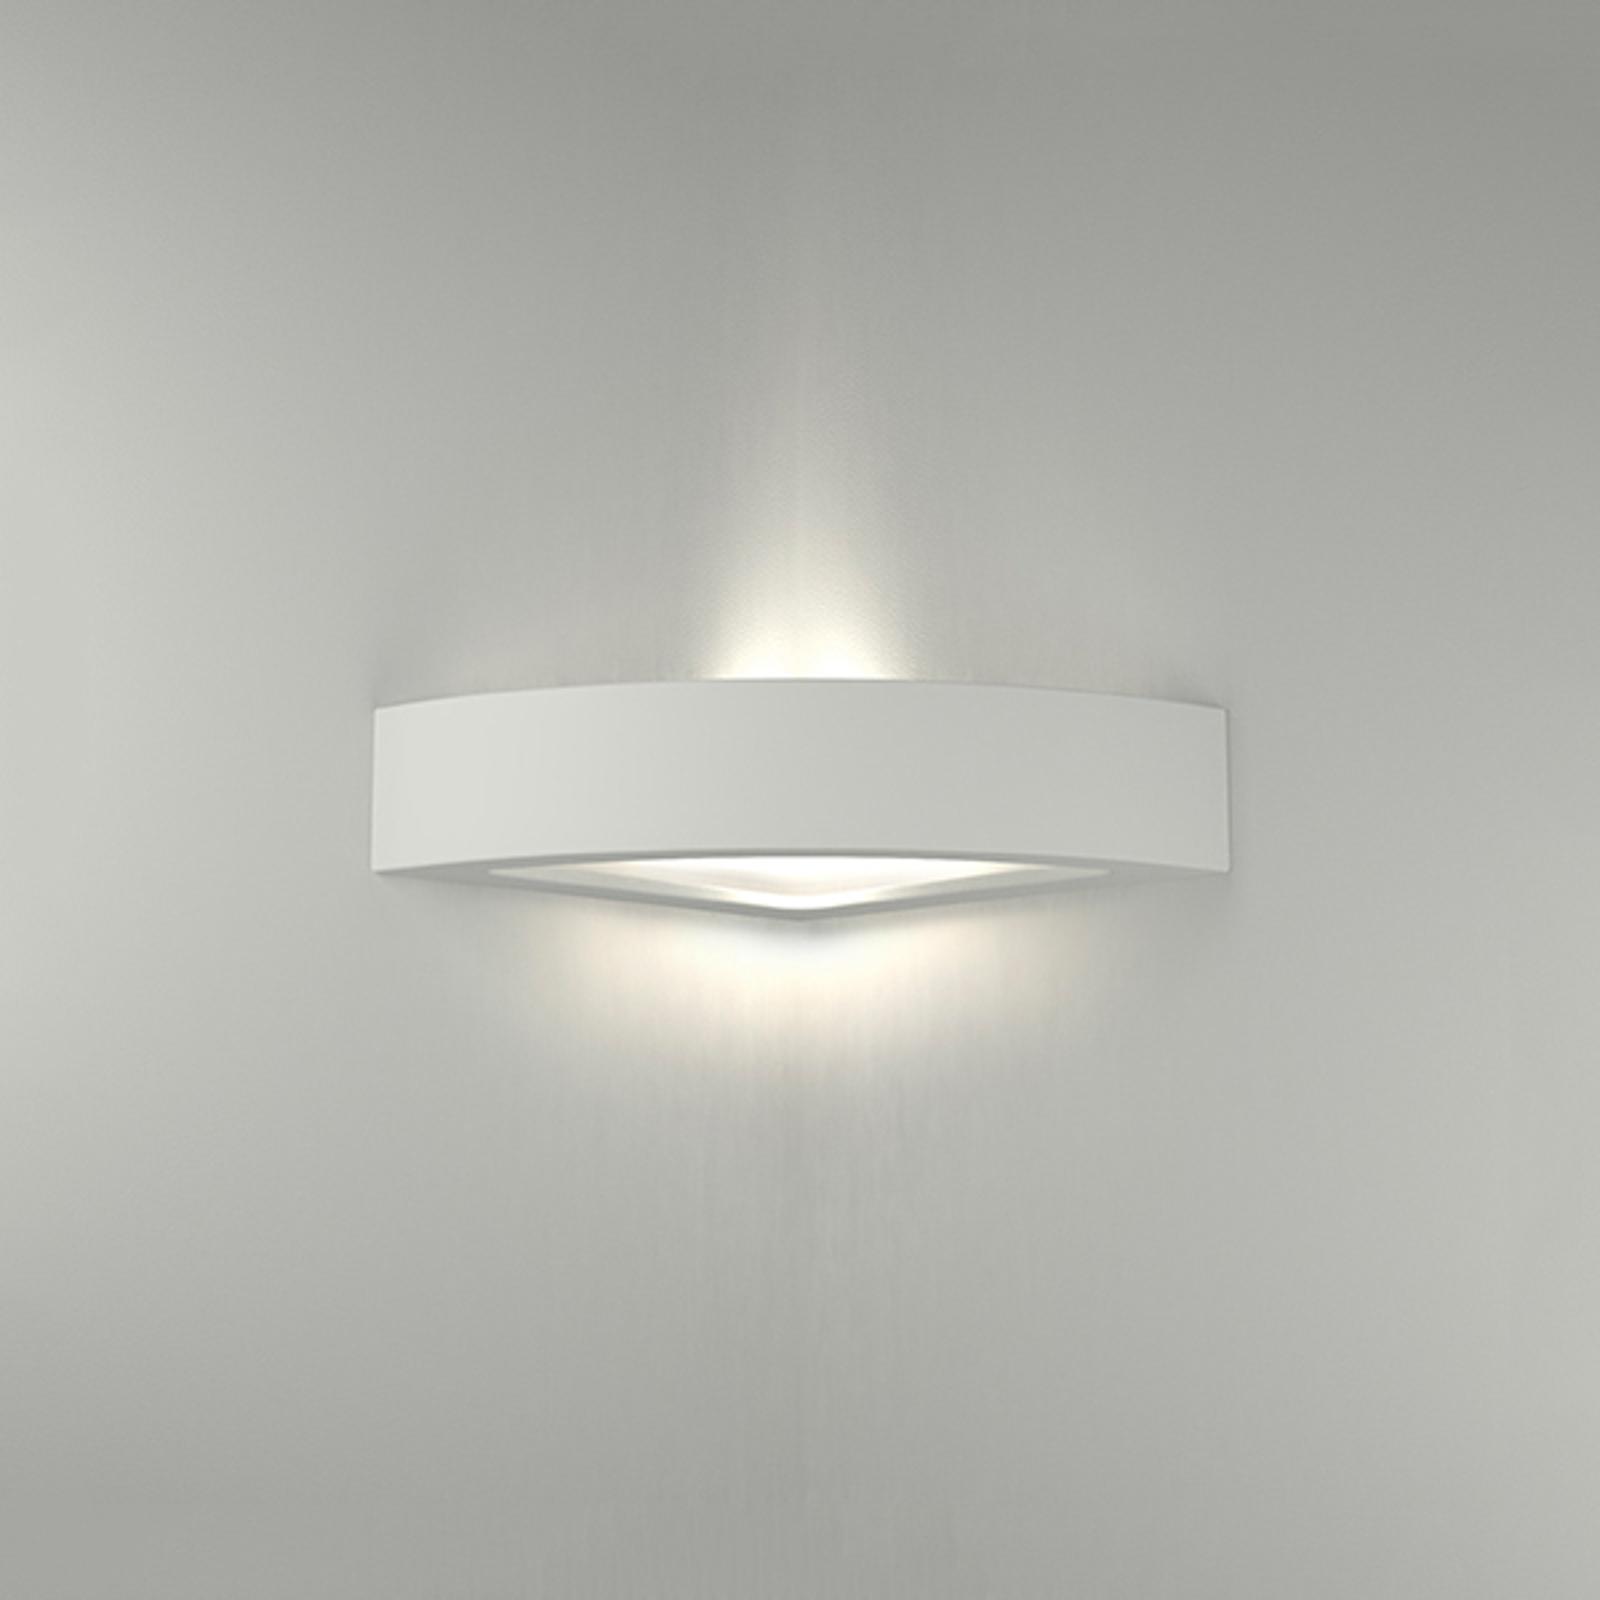 LED wandlamp 8056 hoekmontage 3.000 K niet dimbaar